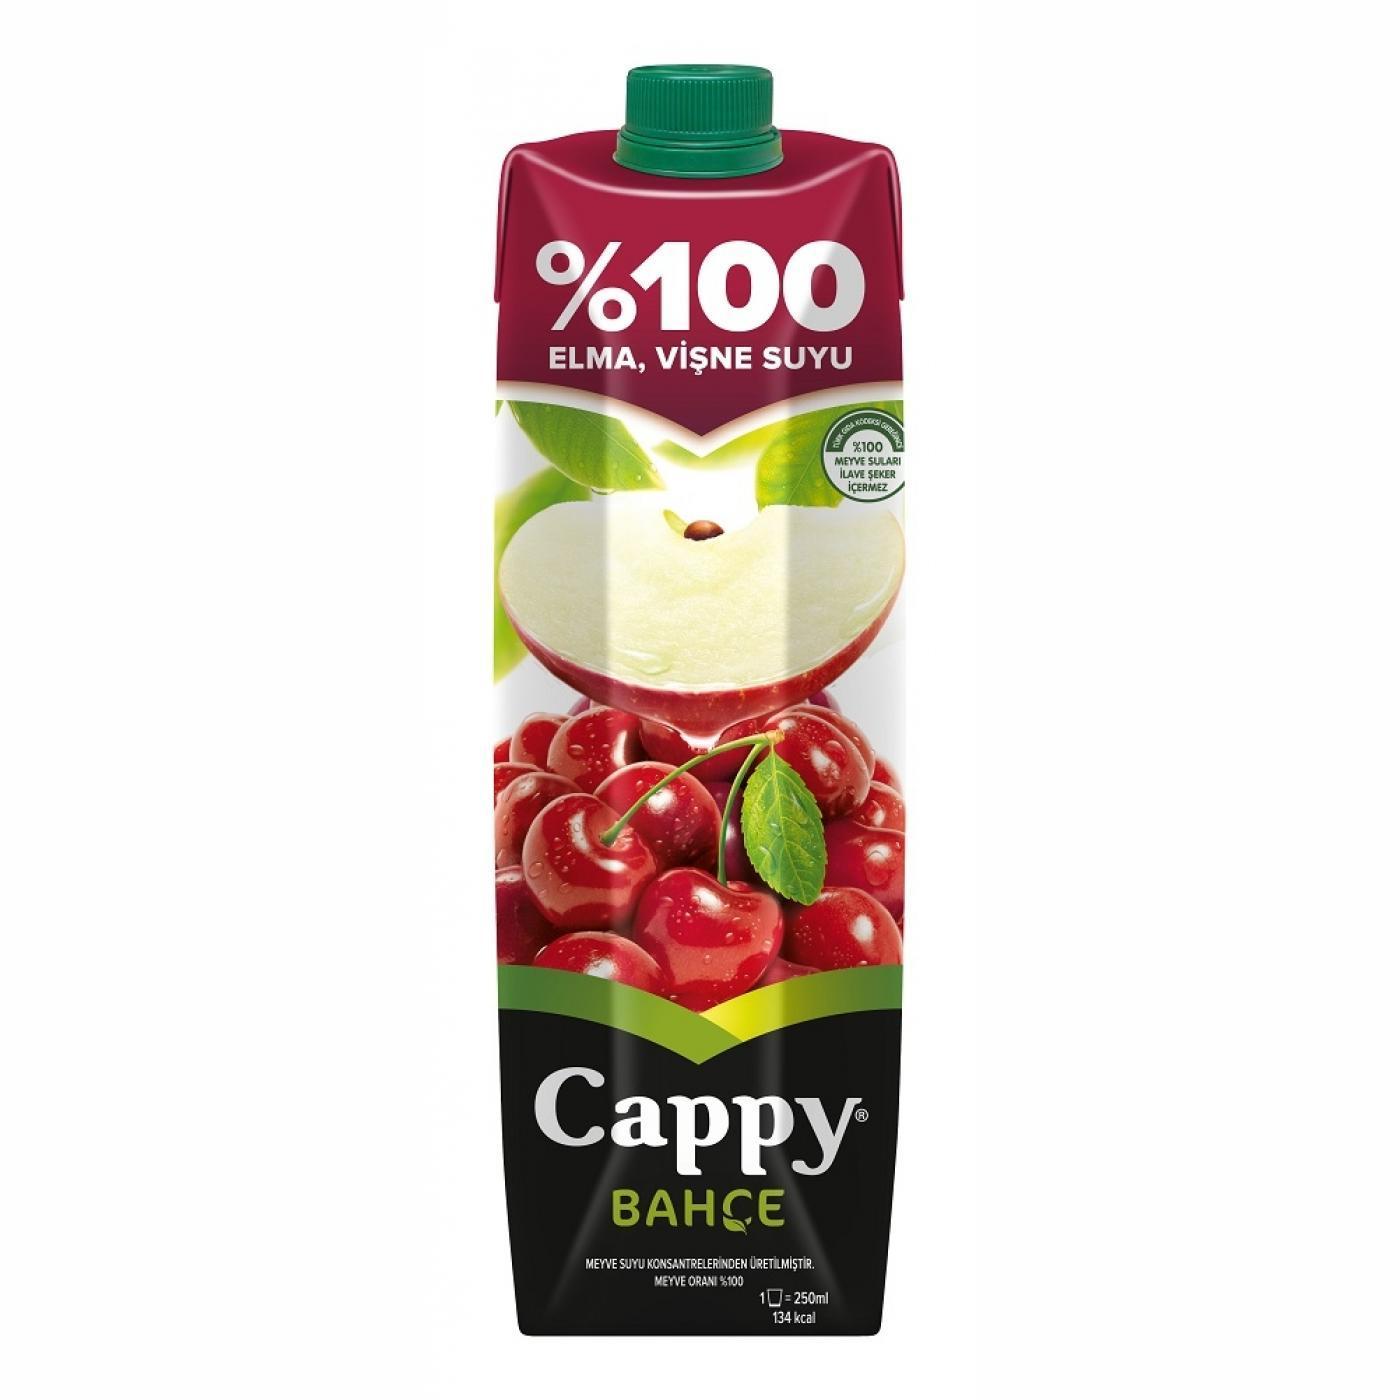 CAPPY 1LT %100 ELMA-VİŞNE